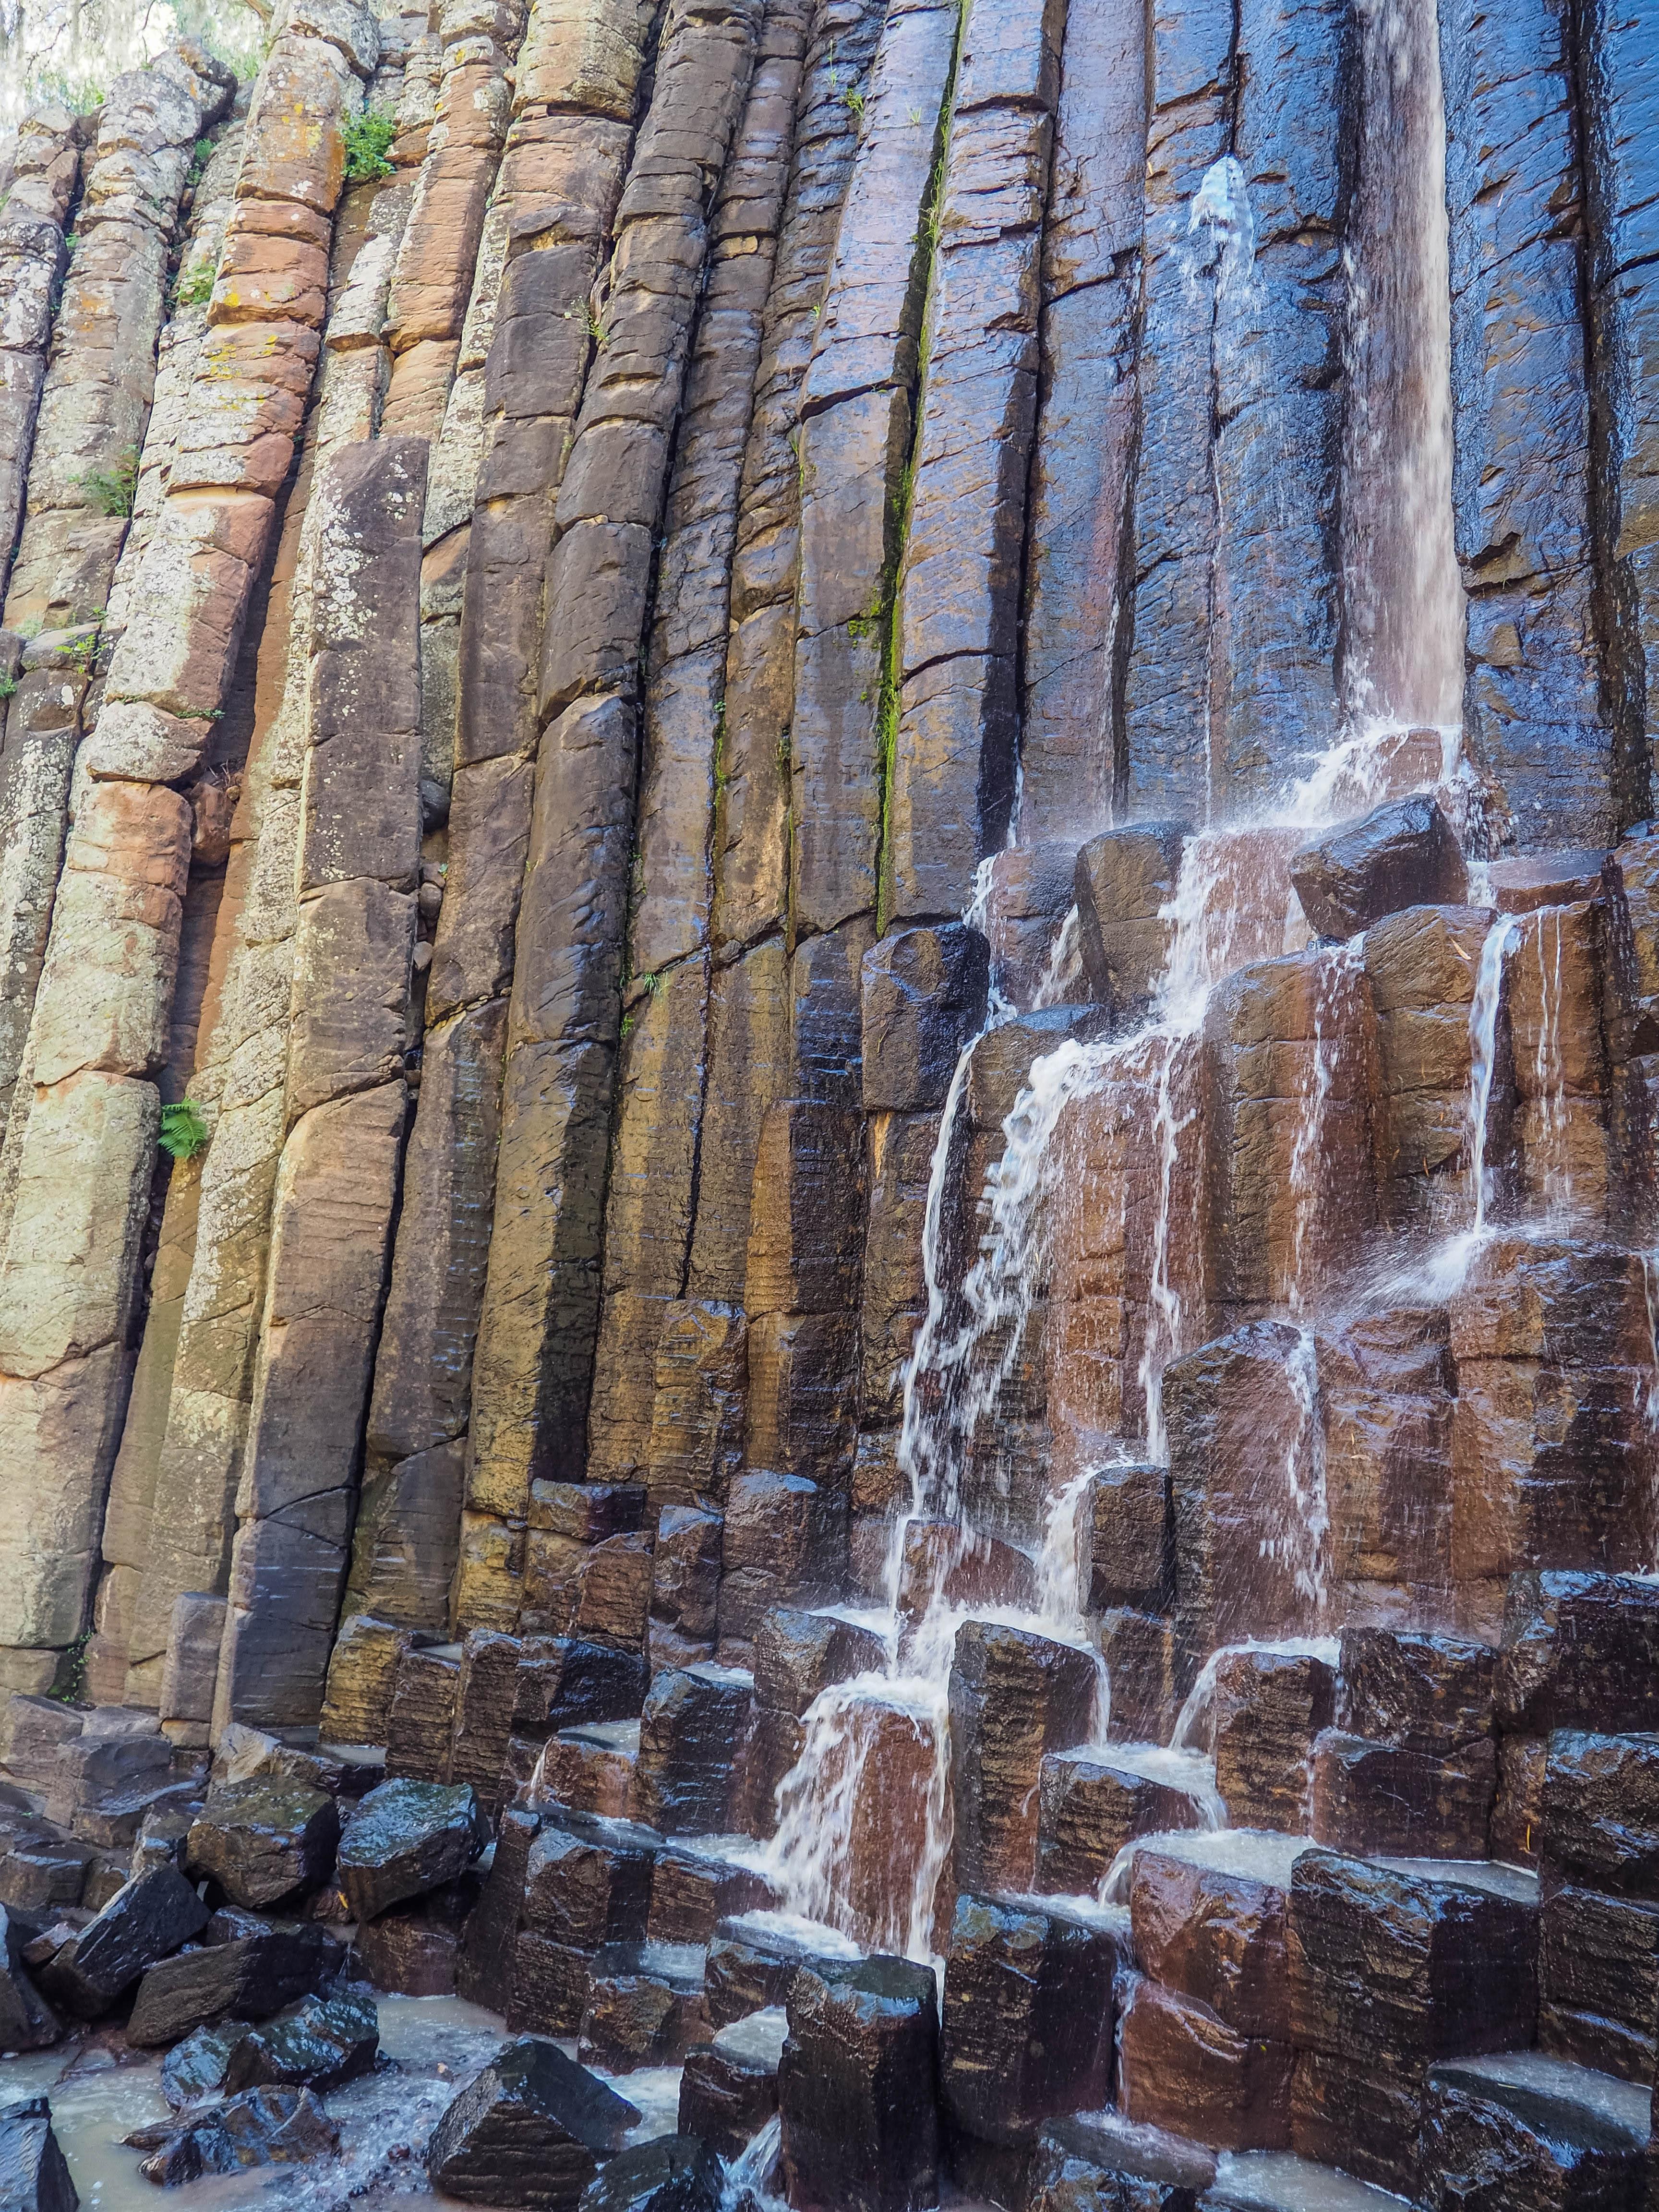 Days 51-52: Basalt Pillars and the Caves of Tolantogo | Terra Trekkers